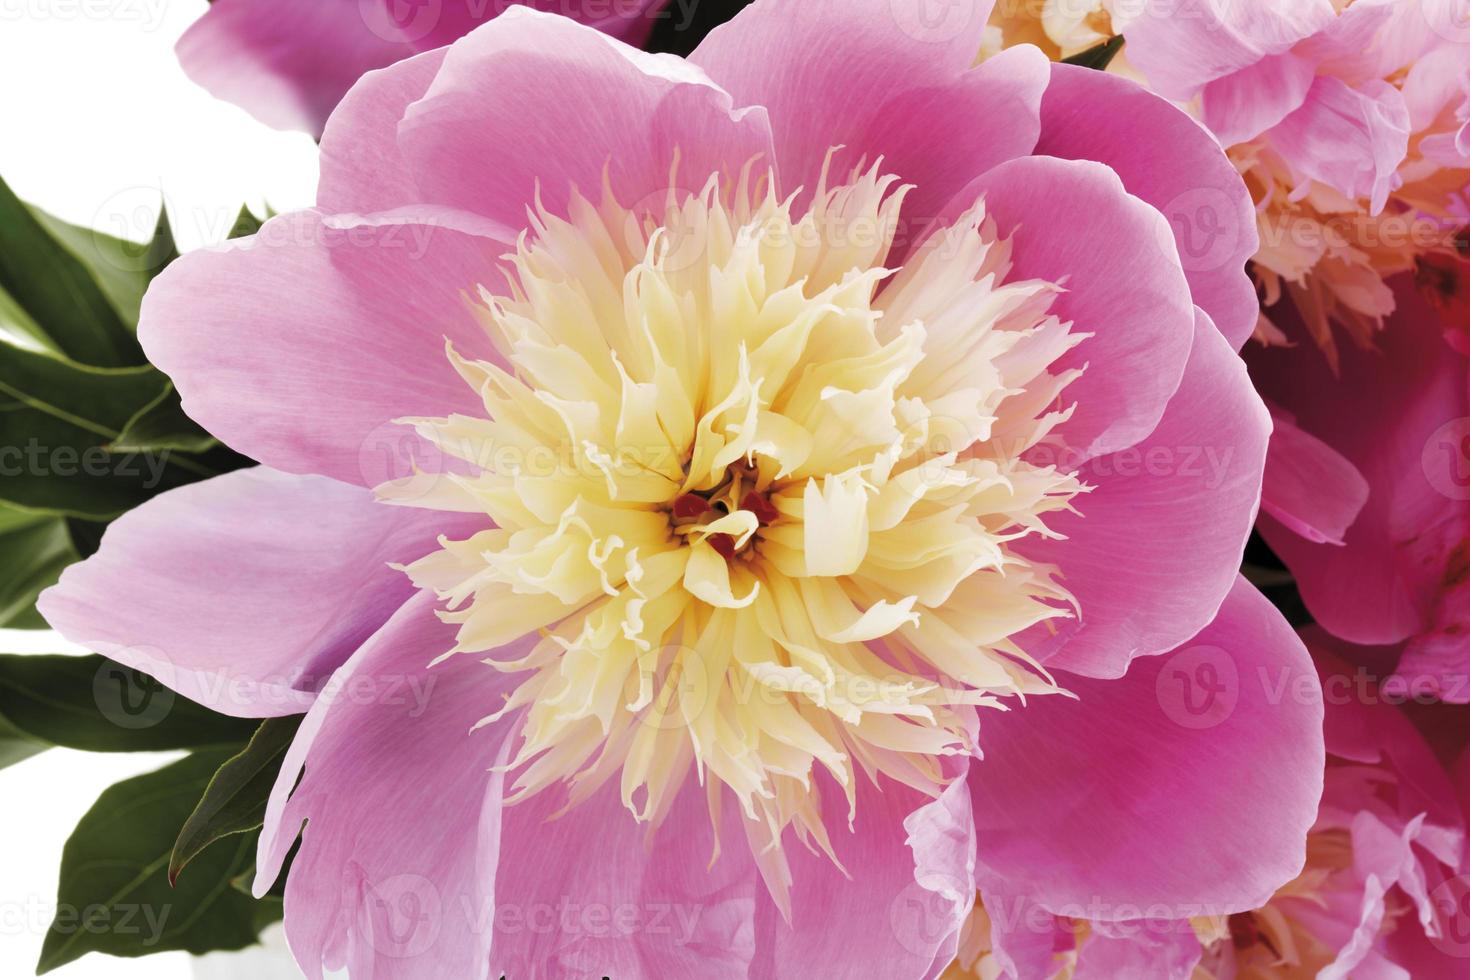 pioenroos (paeonia), close-up foto